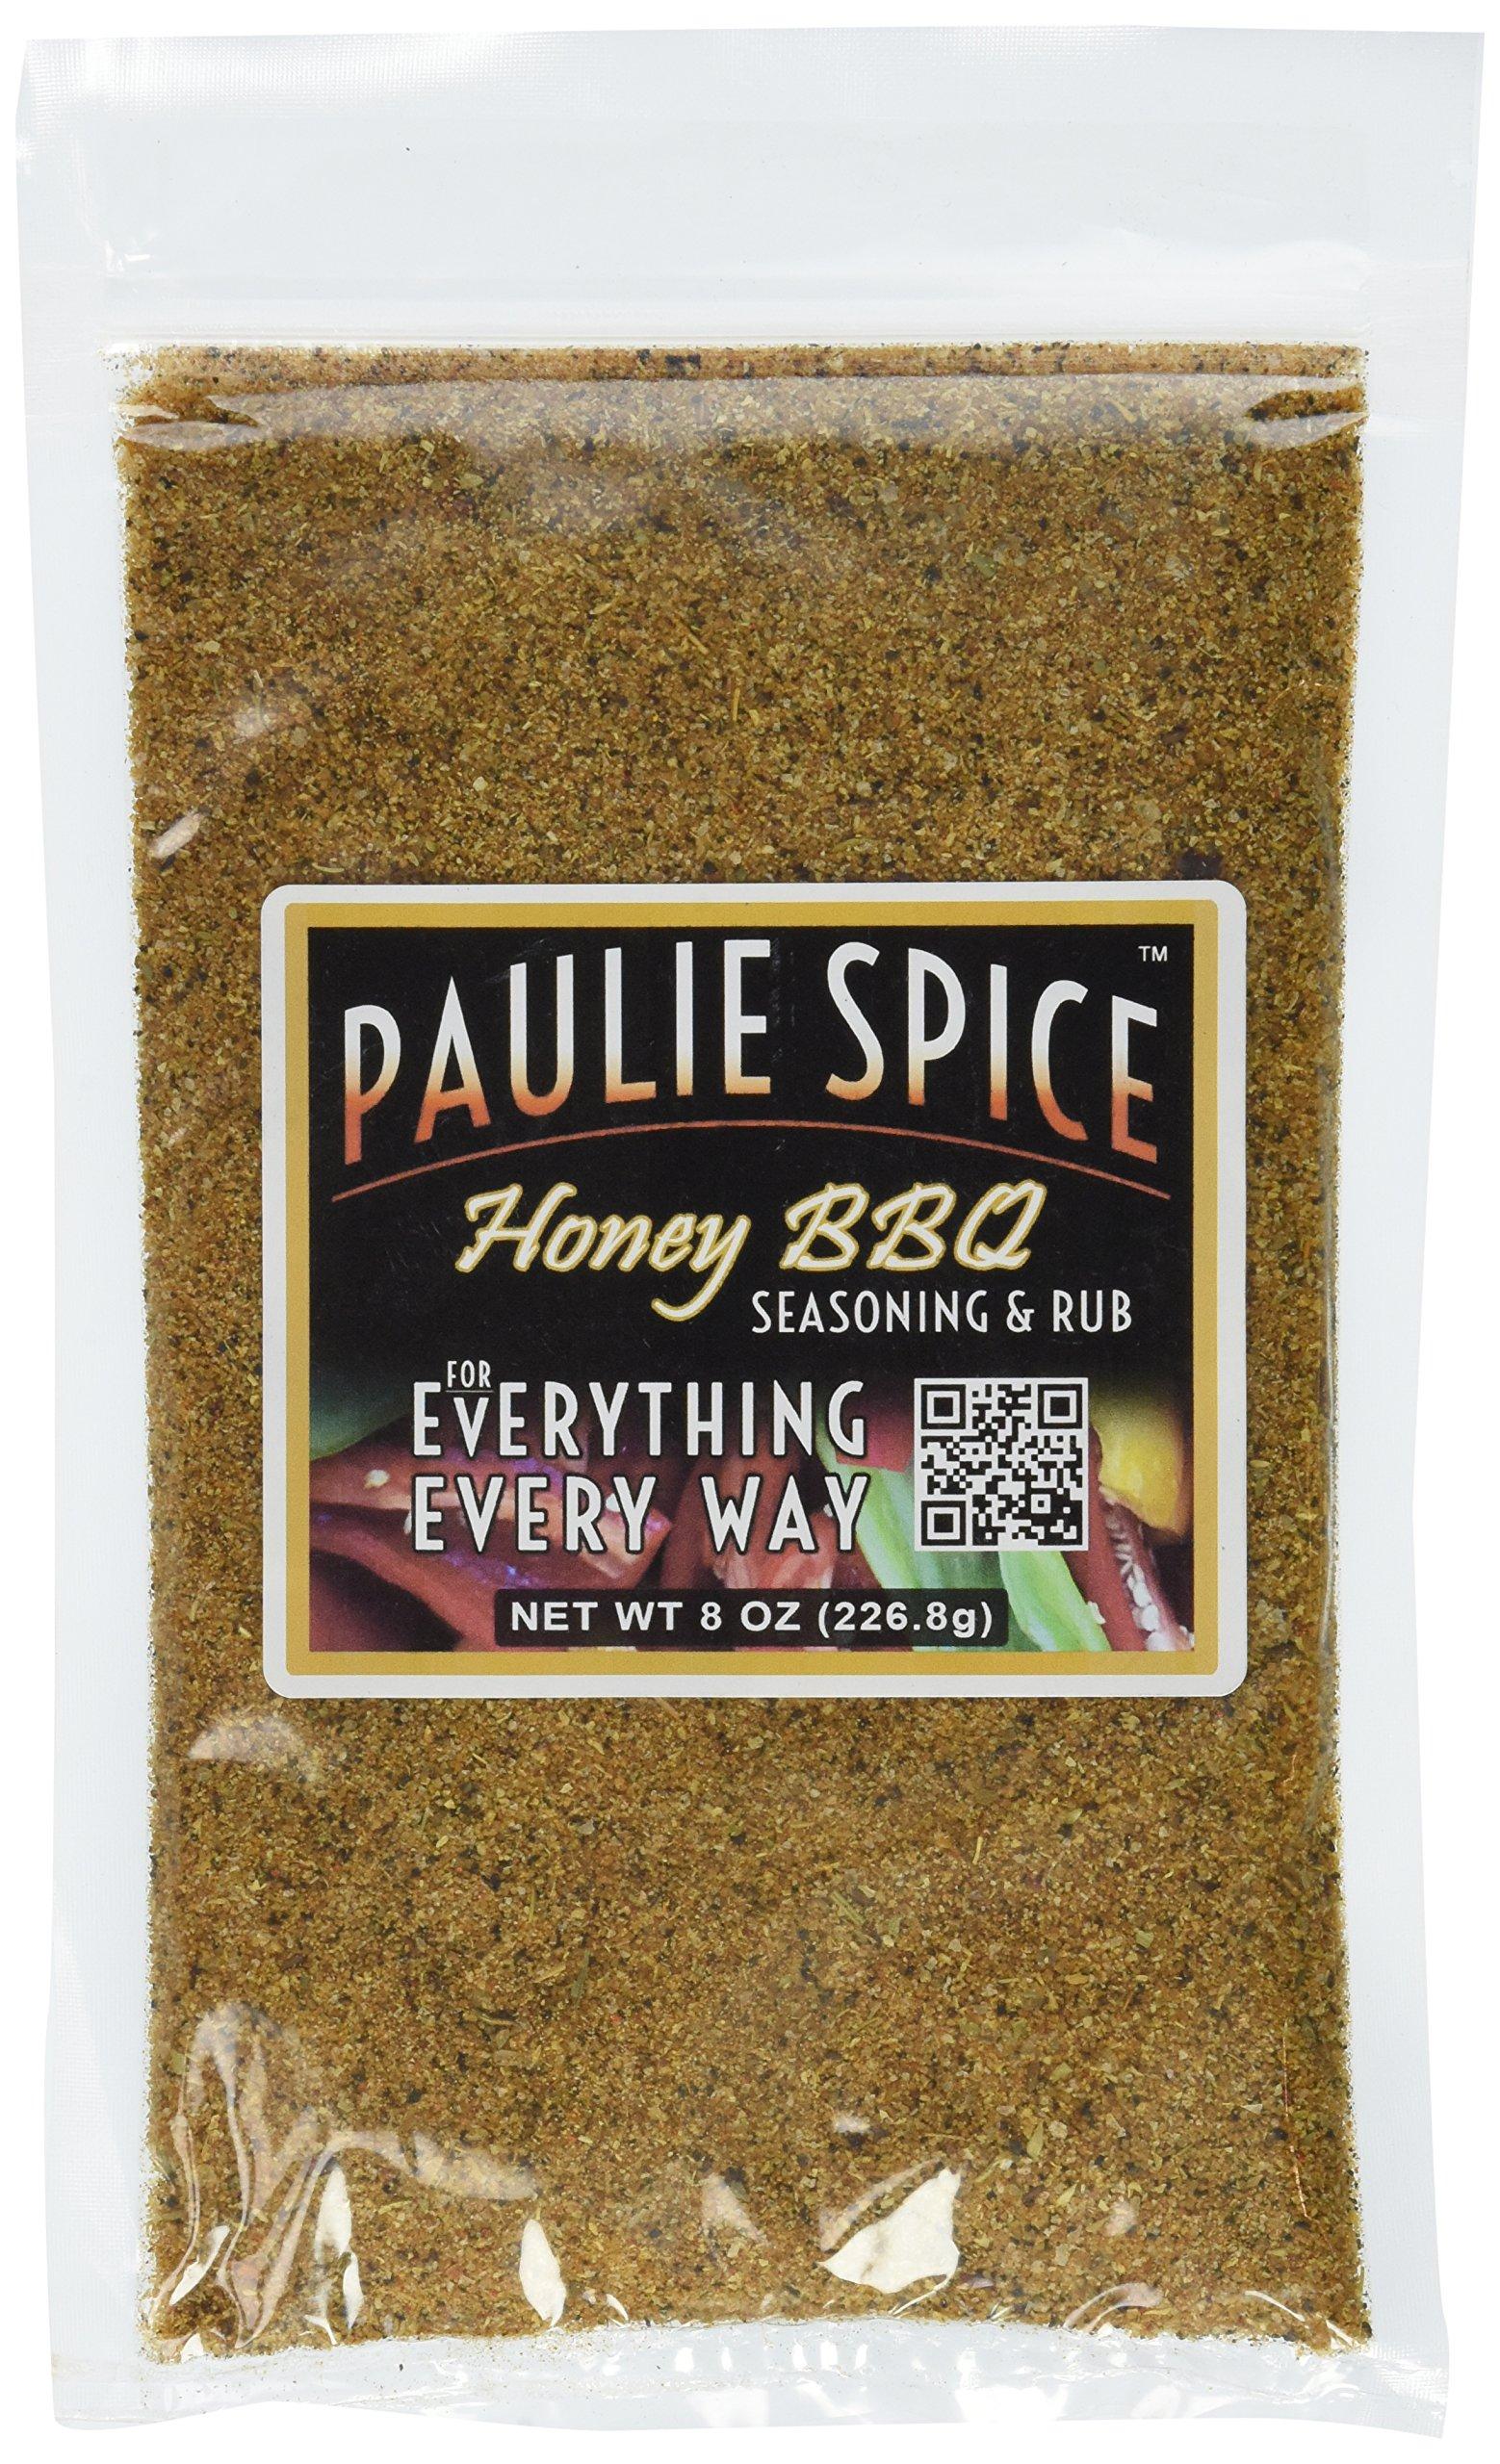 Paulie Spice : Sweet Honey BBQ Gourmet Seasoning and Rub For: Meat, Ribs, Rib, Chicken, Pork, Steak, Wings, Turkey, Prime Rib, Fish, Seafood, Grill, Grilling, Barbecue, Smoker, Dry, Rubs, Seasonings